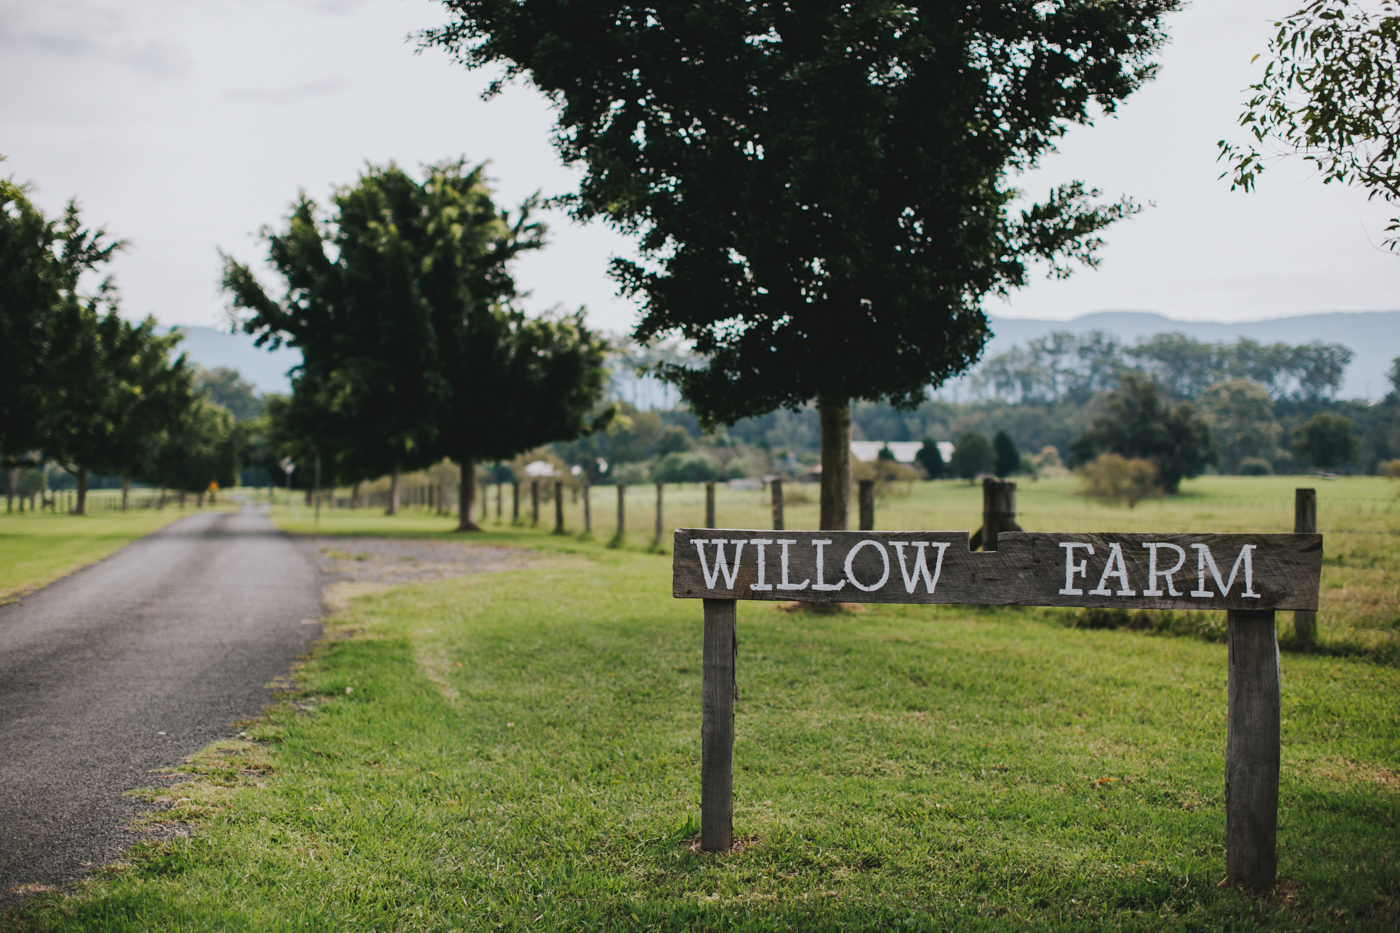 Rachel & Jacob - Willow Farm Berry - South Coast Wedding - Samantha Heather Photography-1.jpg